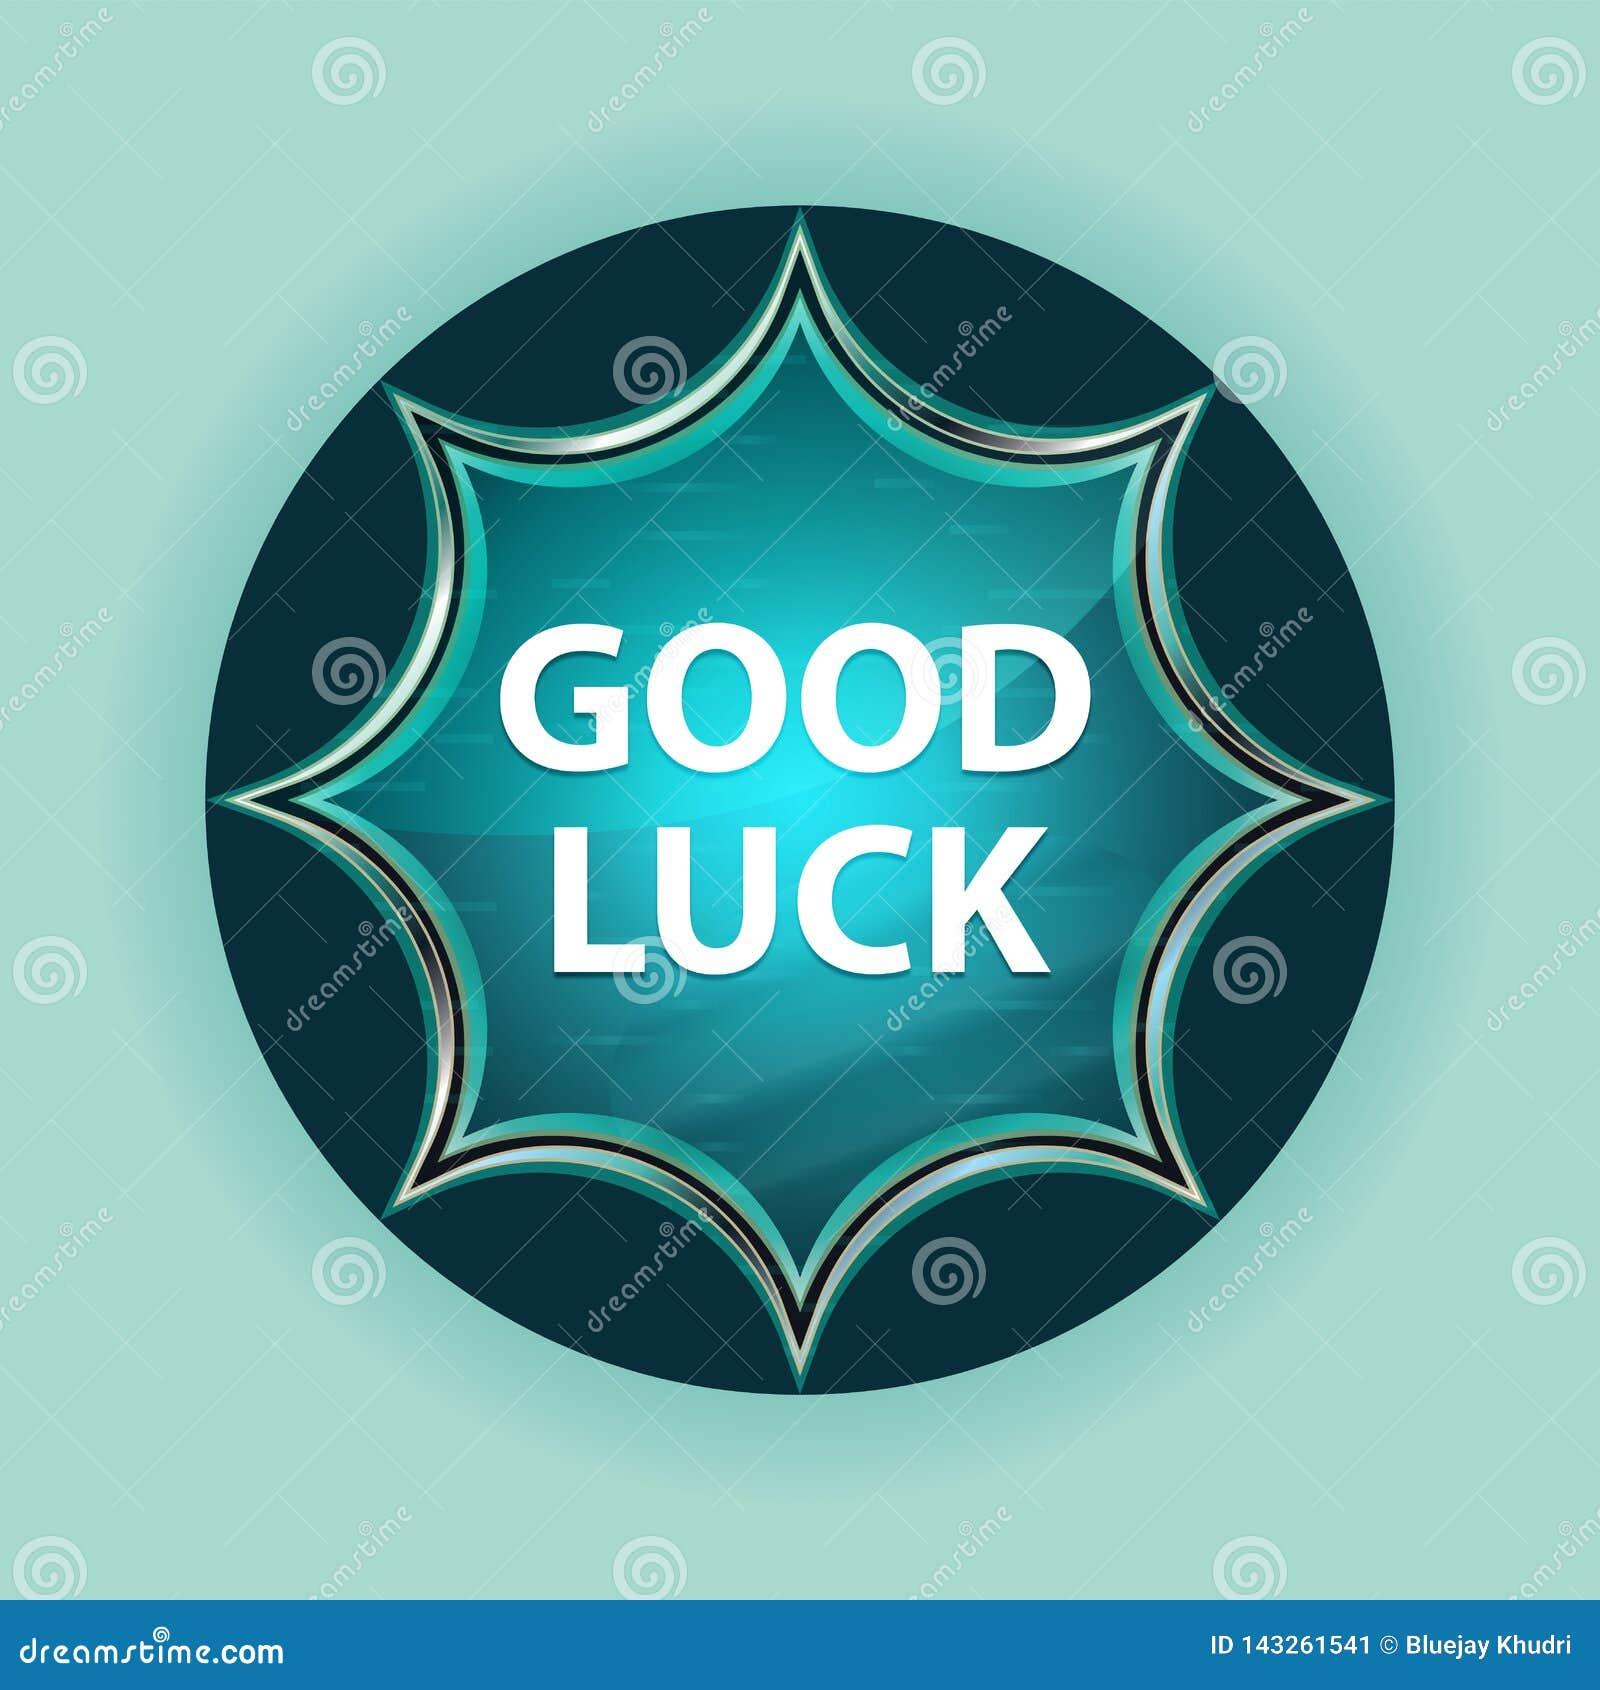 Good Luck magical glassy sunburst blue button sky blue background